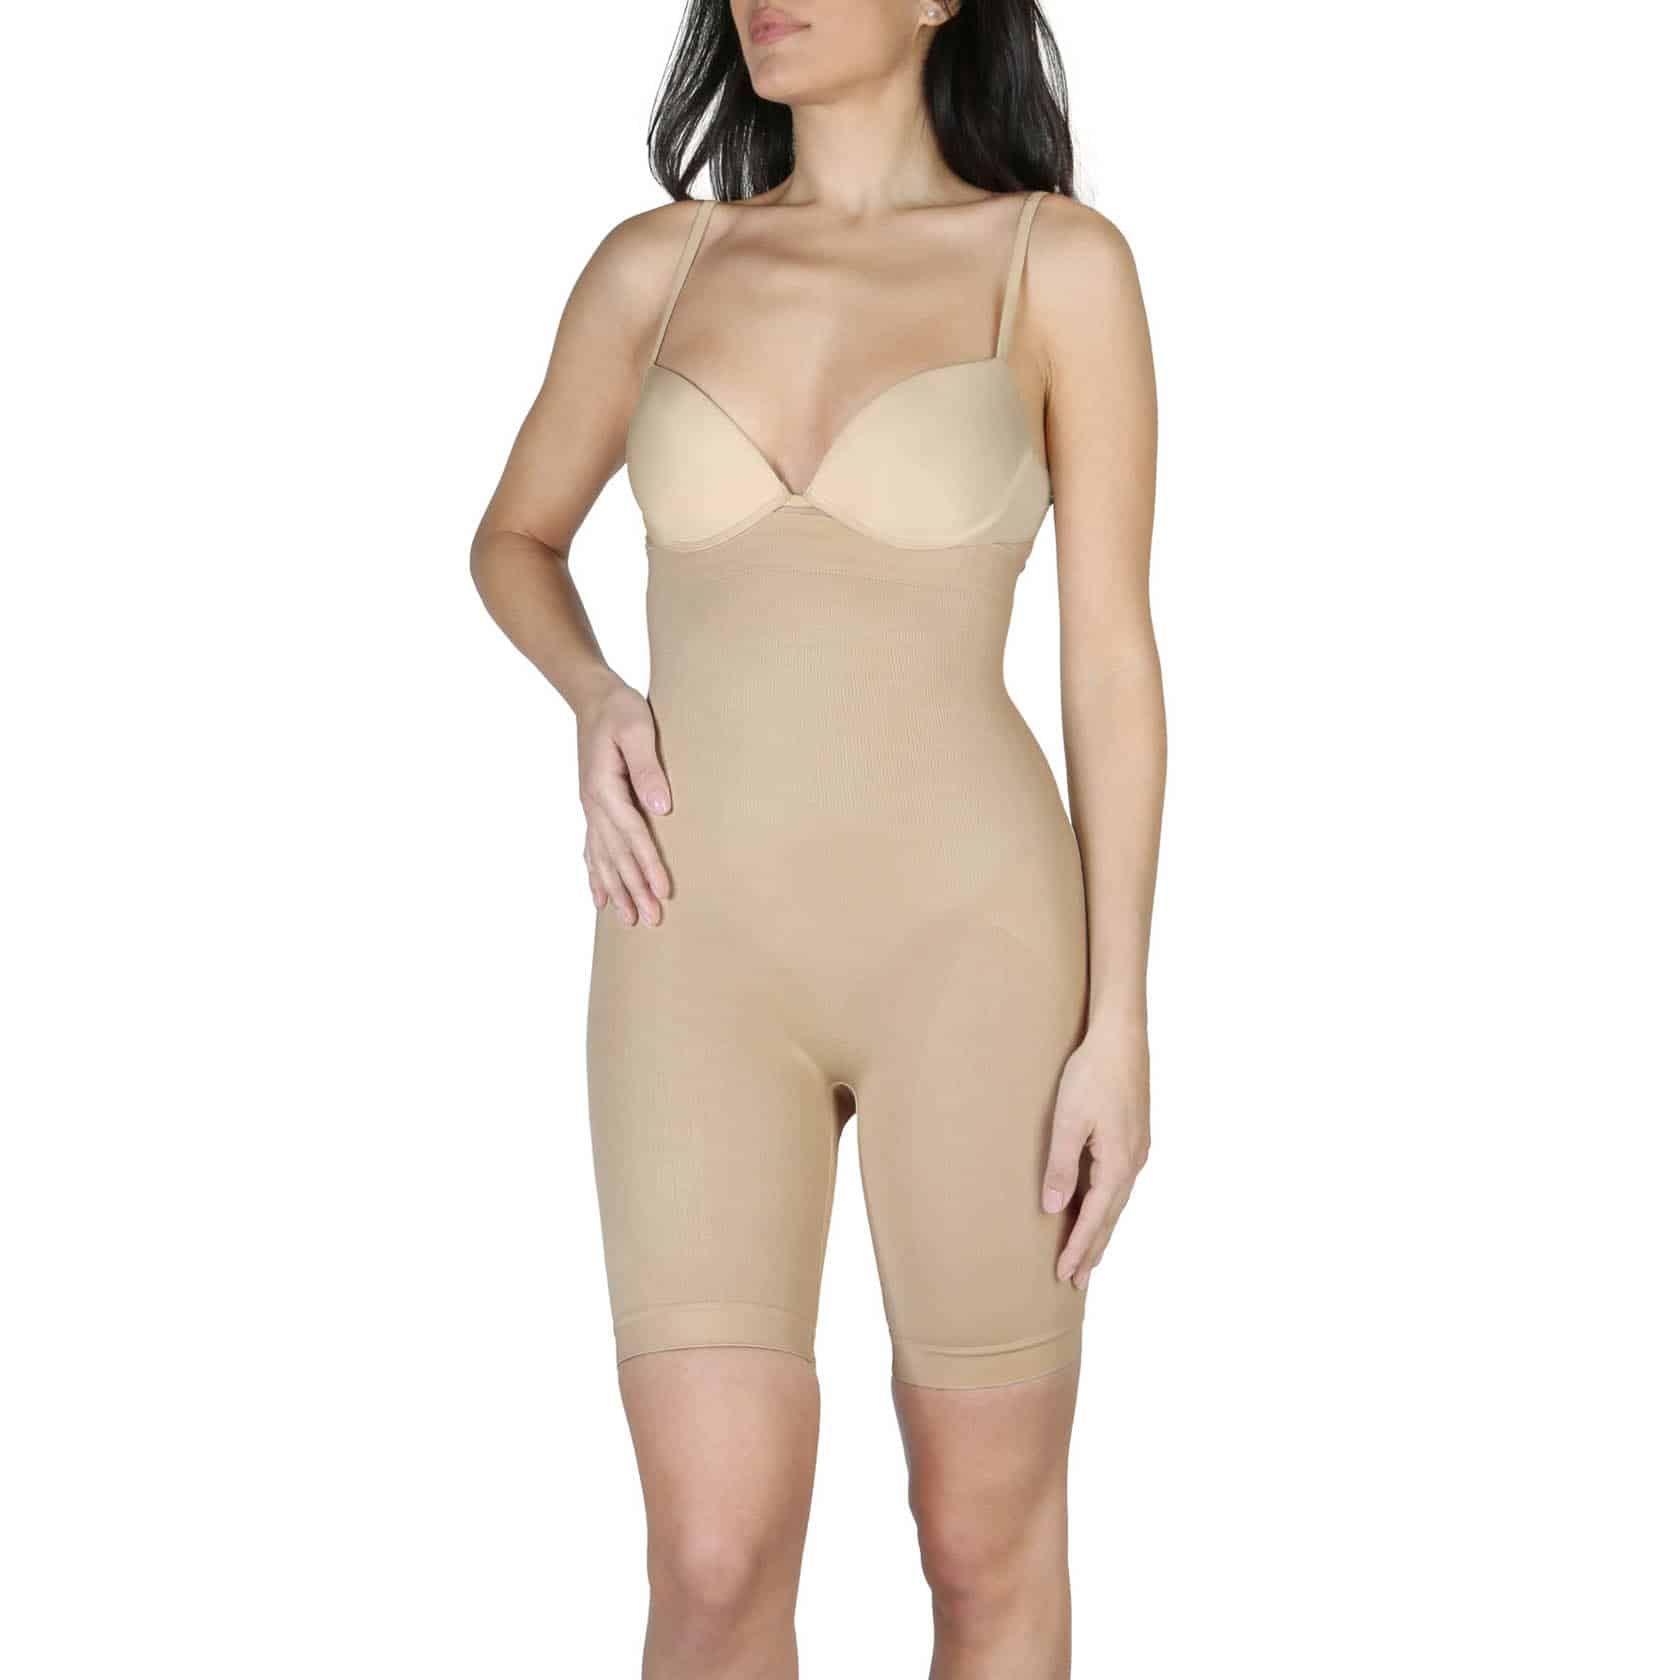 Shaping underwear Bodyboo – BB1010